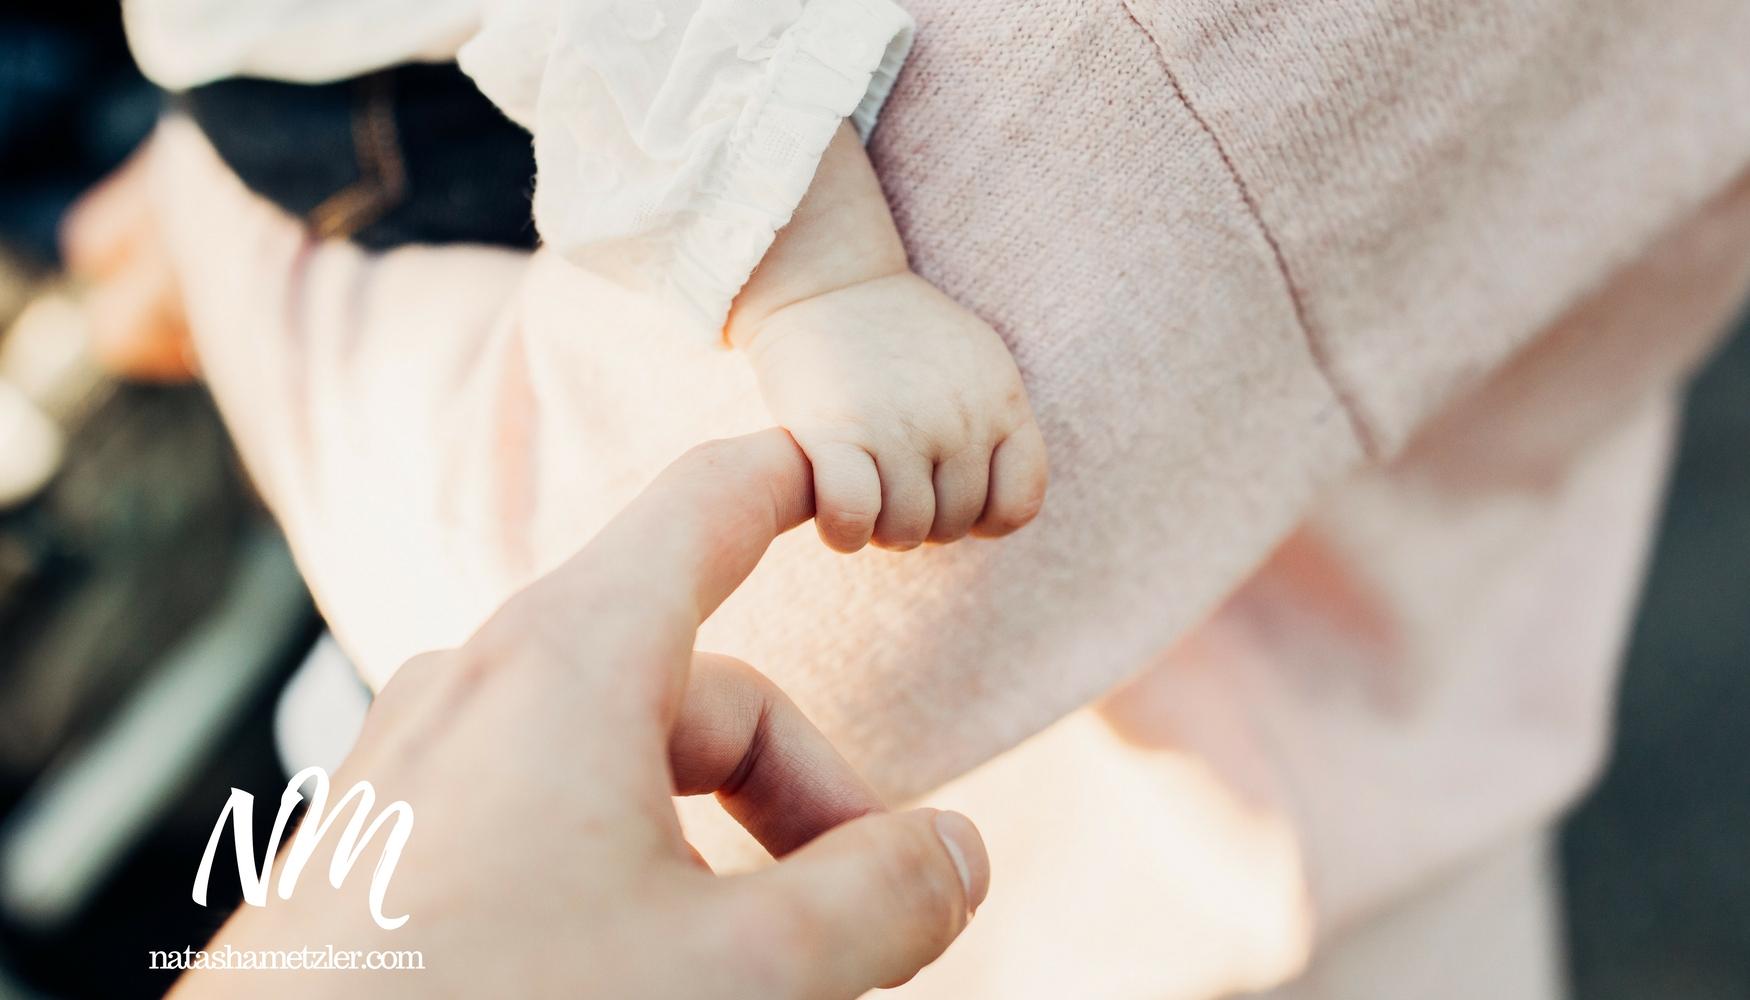 A Baby Won't Fix My Infertility